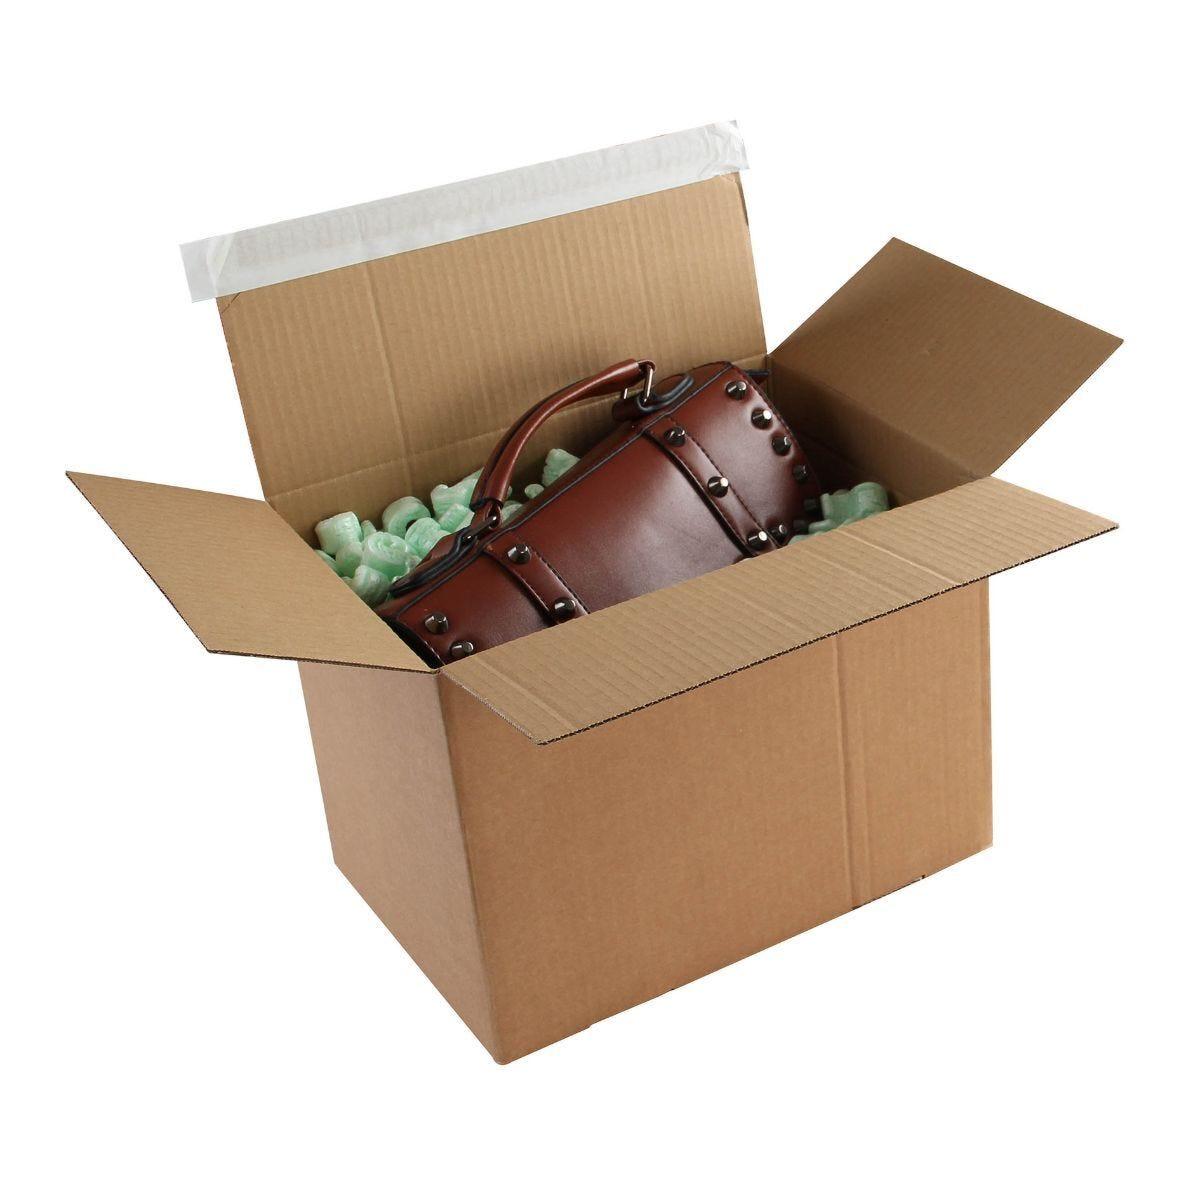 Blake Packaging Postal Box 400 x 260 x 250mm Pack of 20